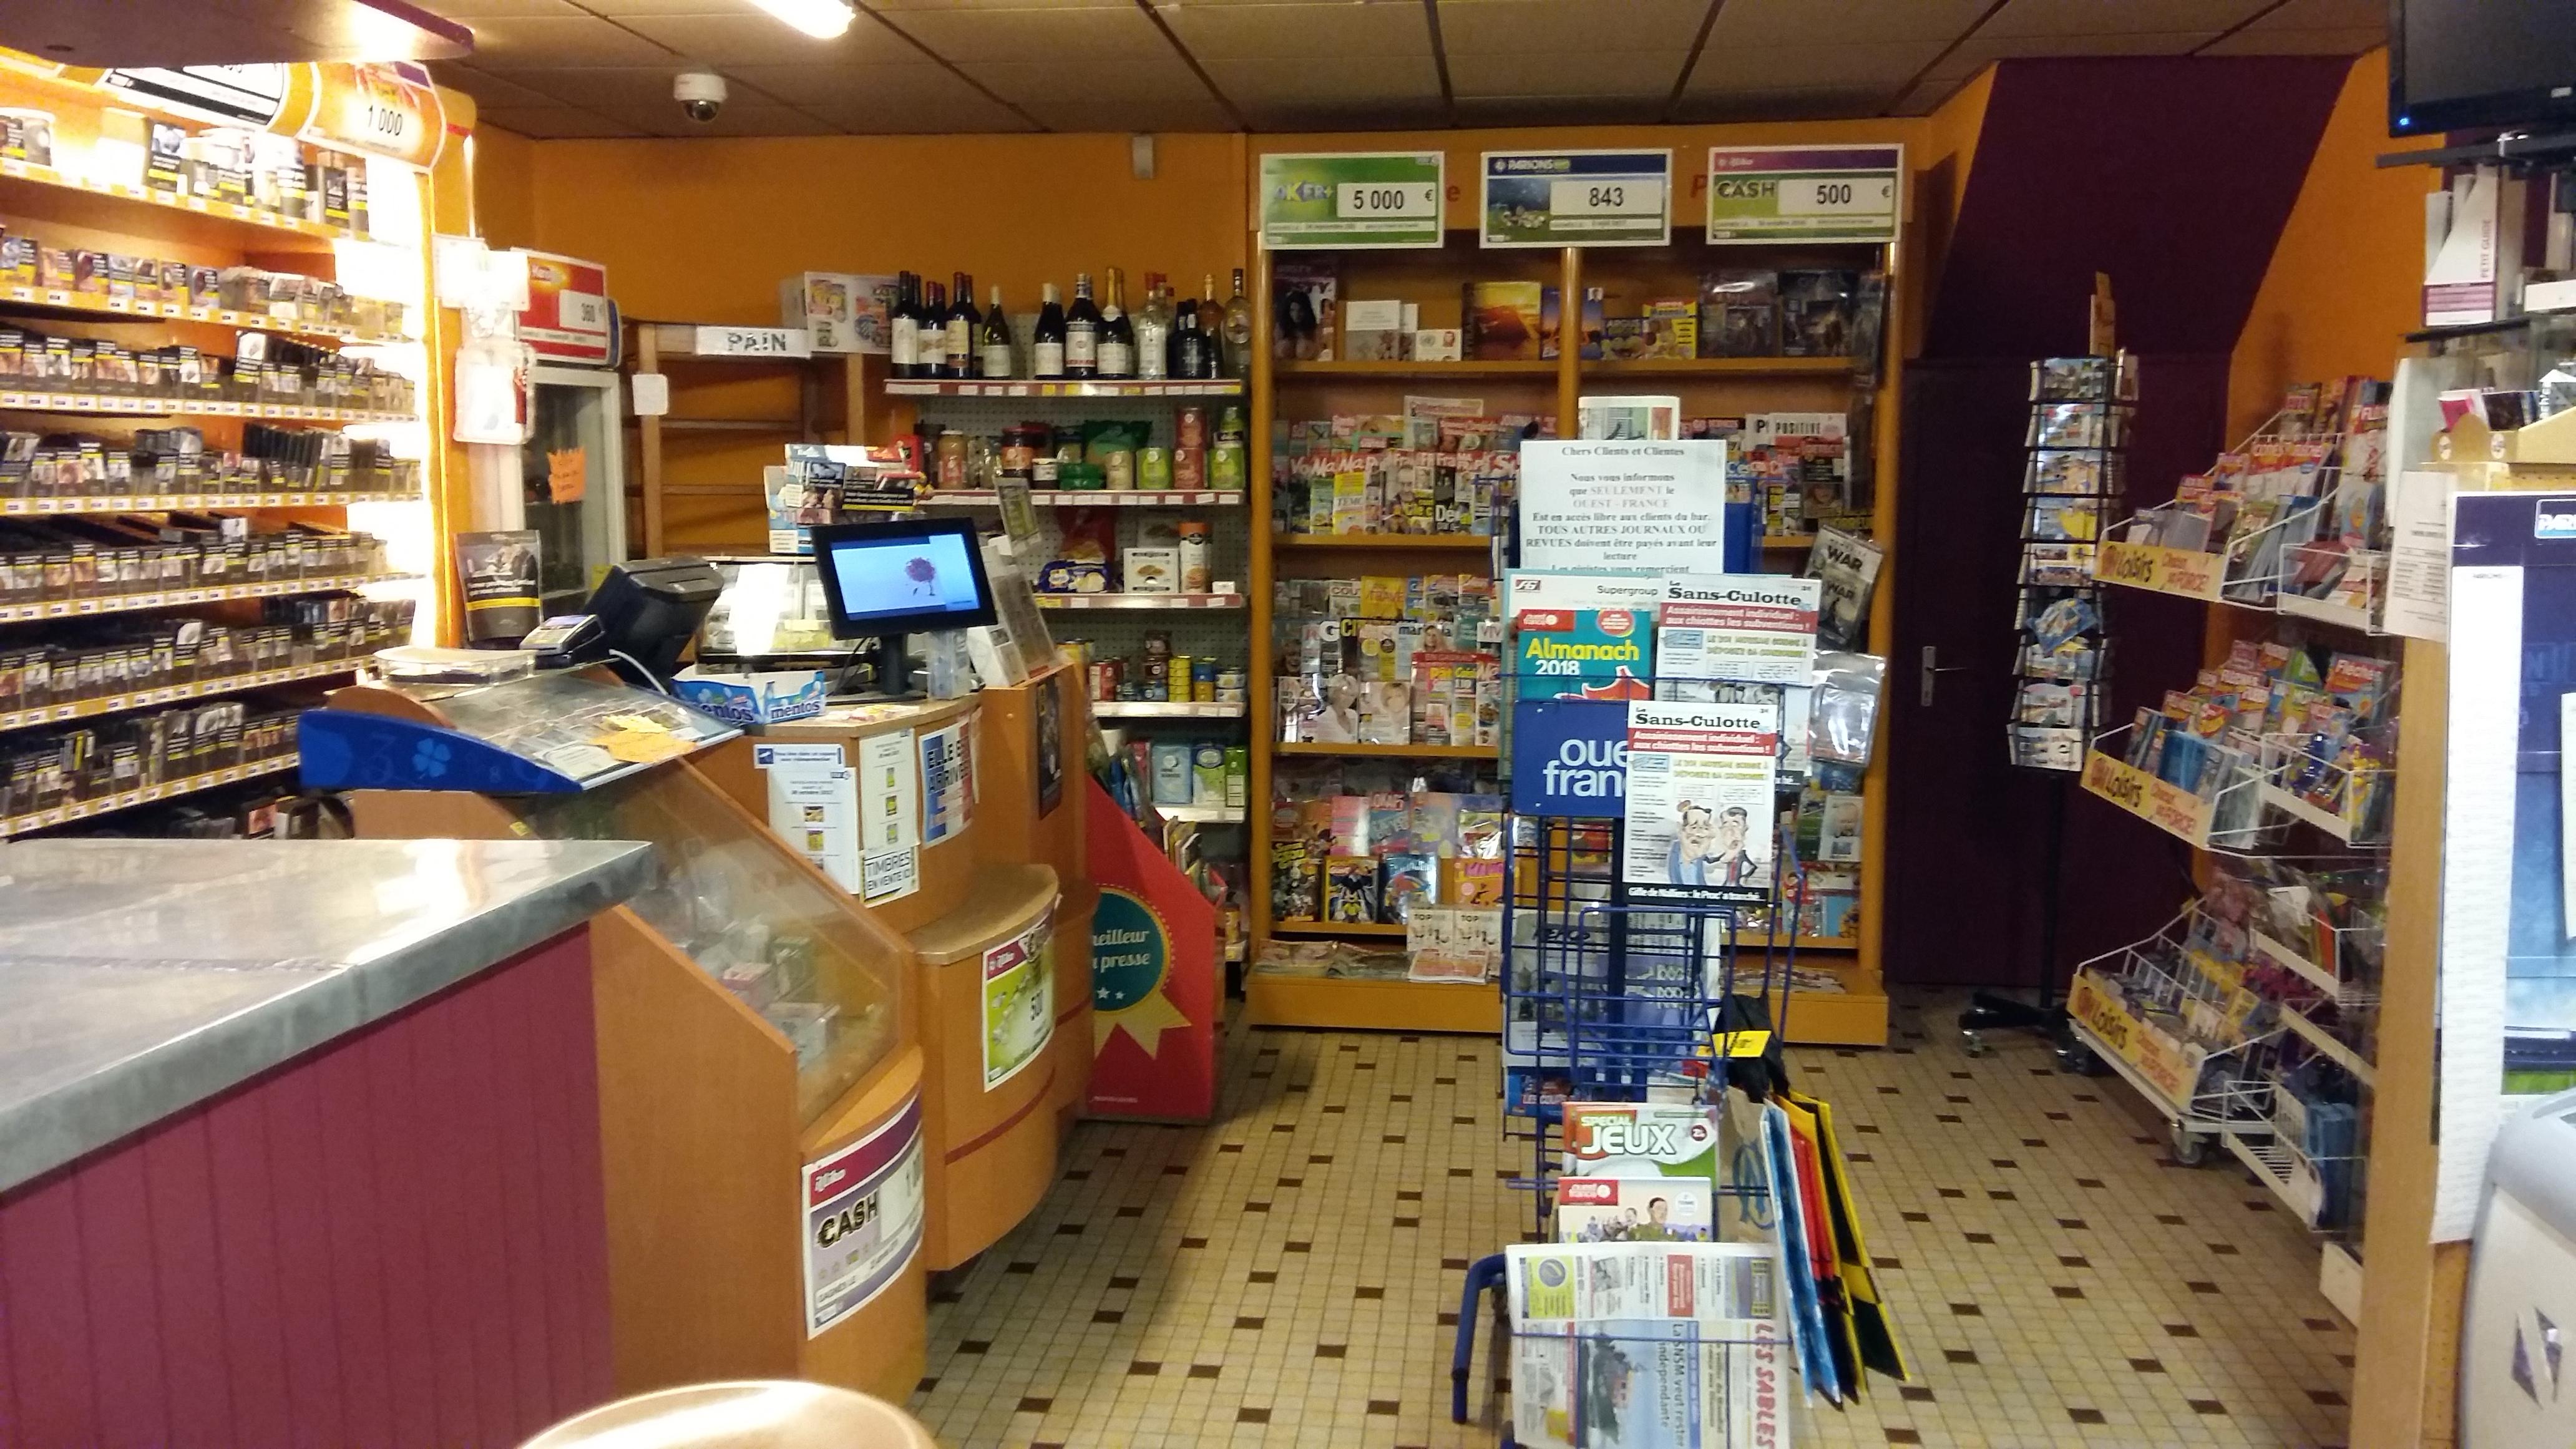 Bureau tabac le plus proche le tabac presse proche du centre